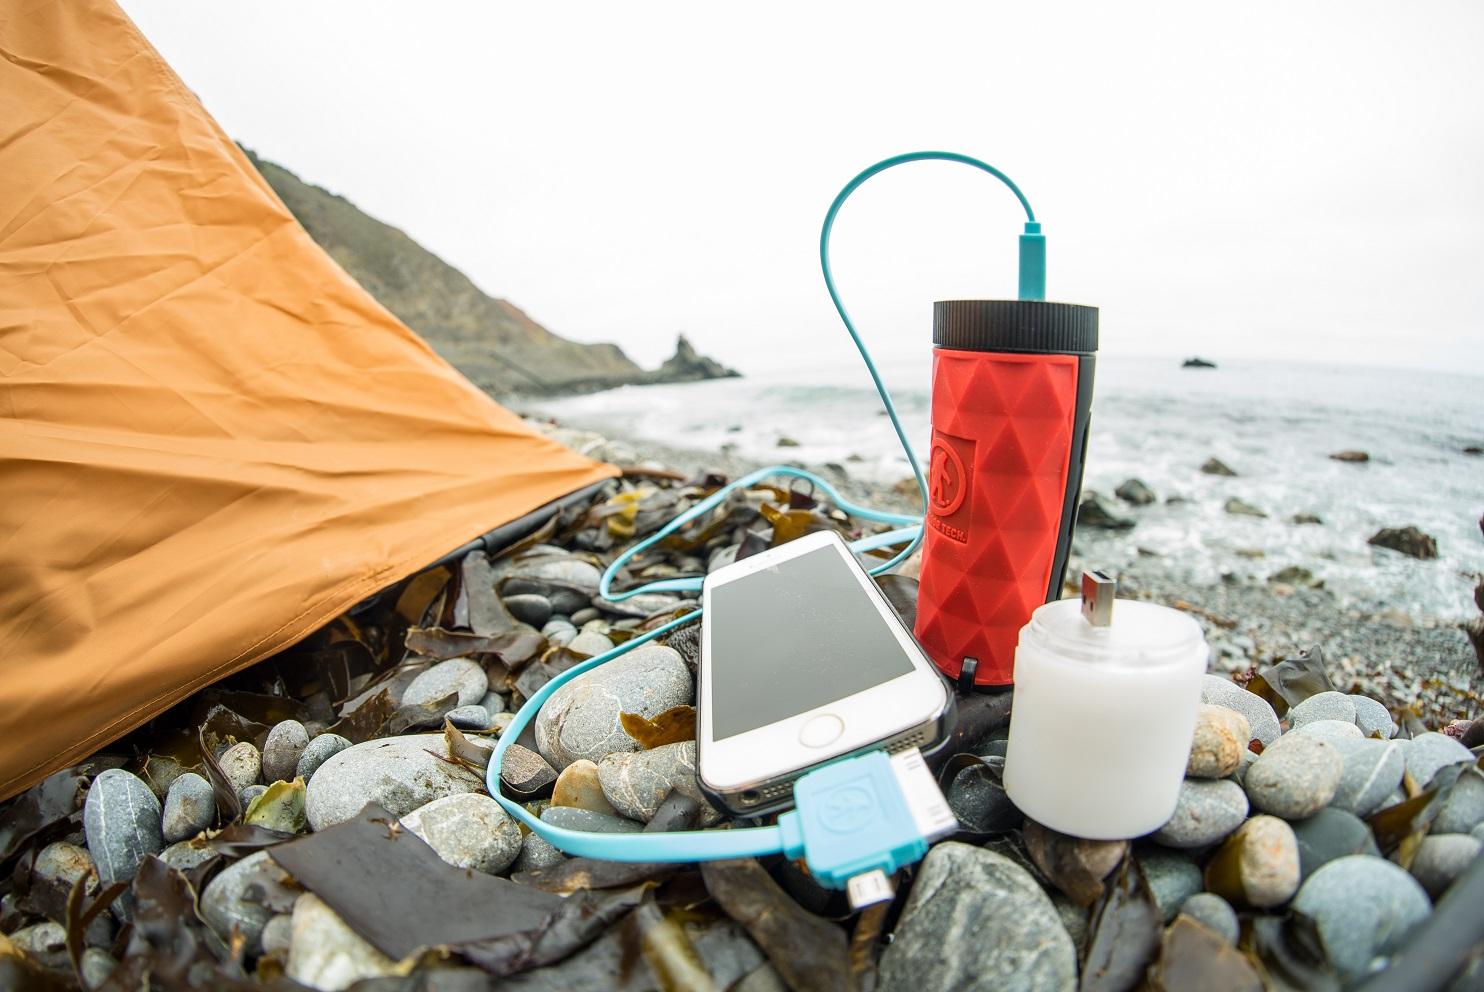 OT1351-R-Buckshot-Pro-Beach-Camping-2-Lifestyle